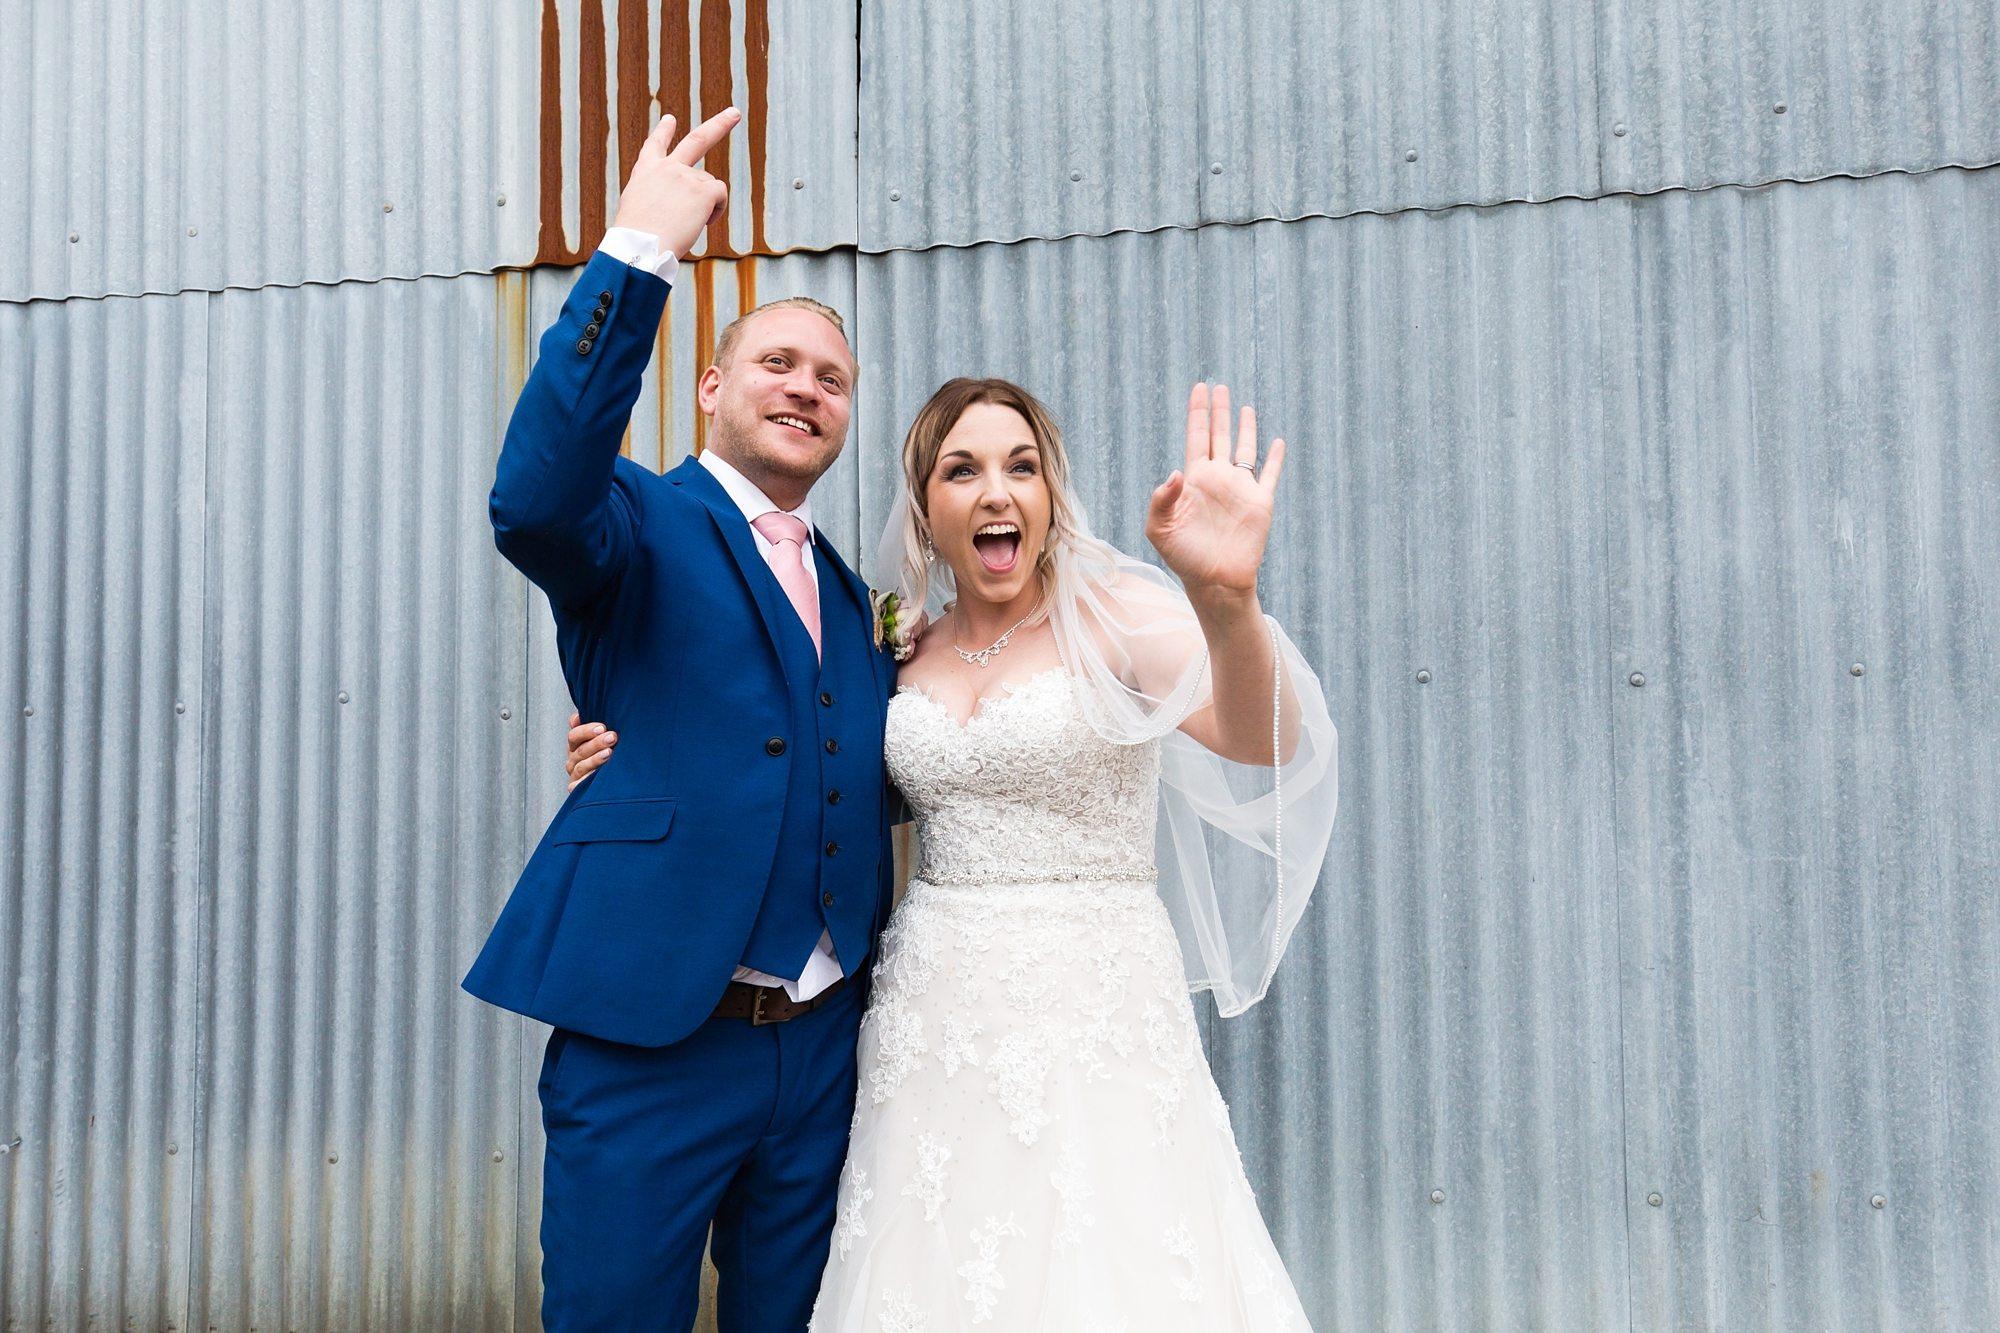 Barn Wedding Tips Funny Photo Tin Background